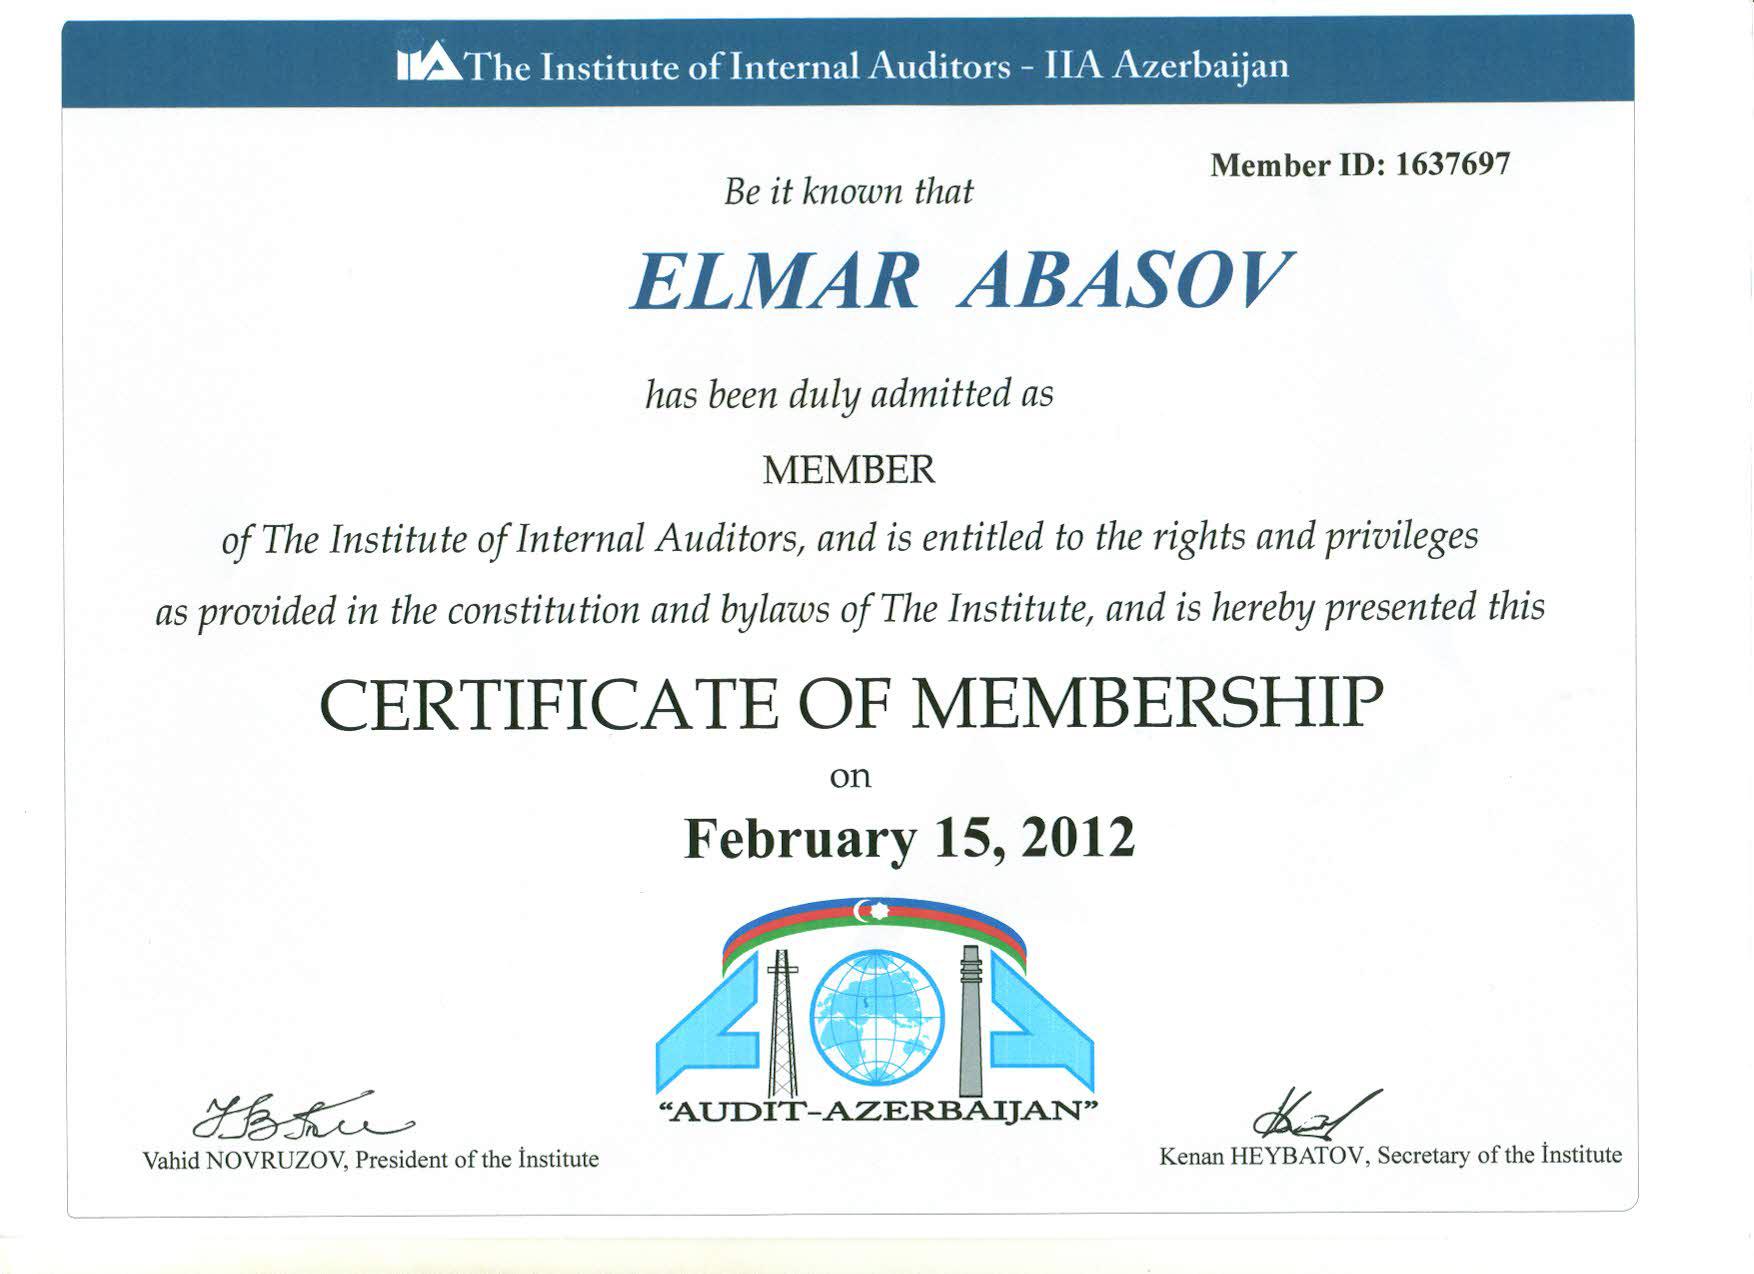 Elmar Abbasov